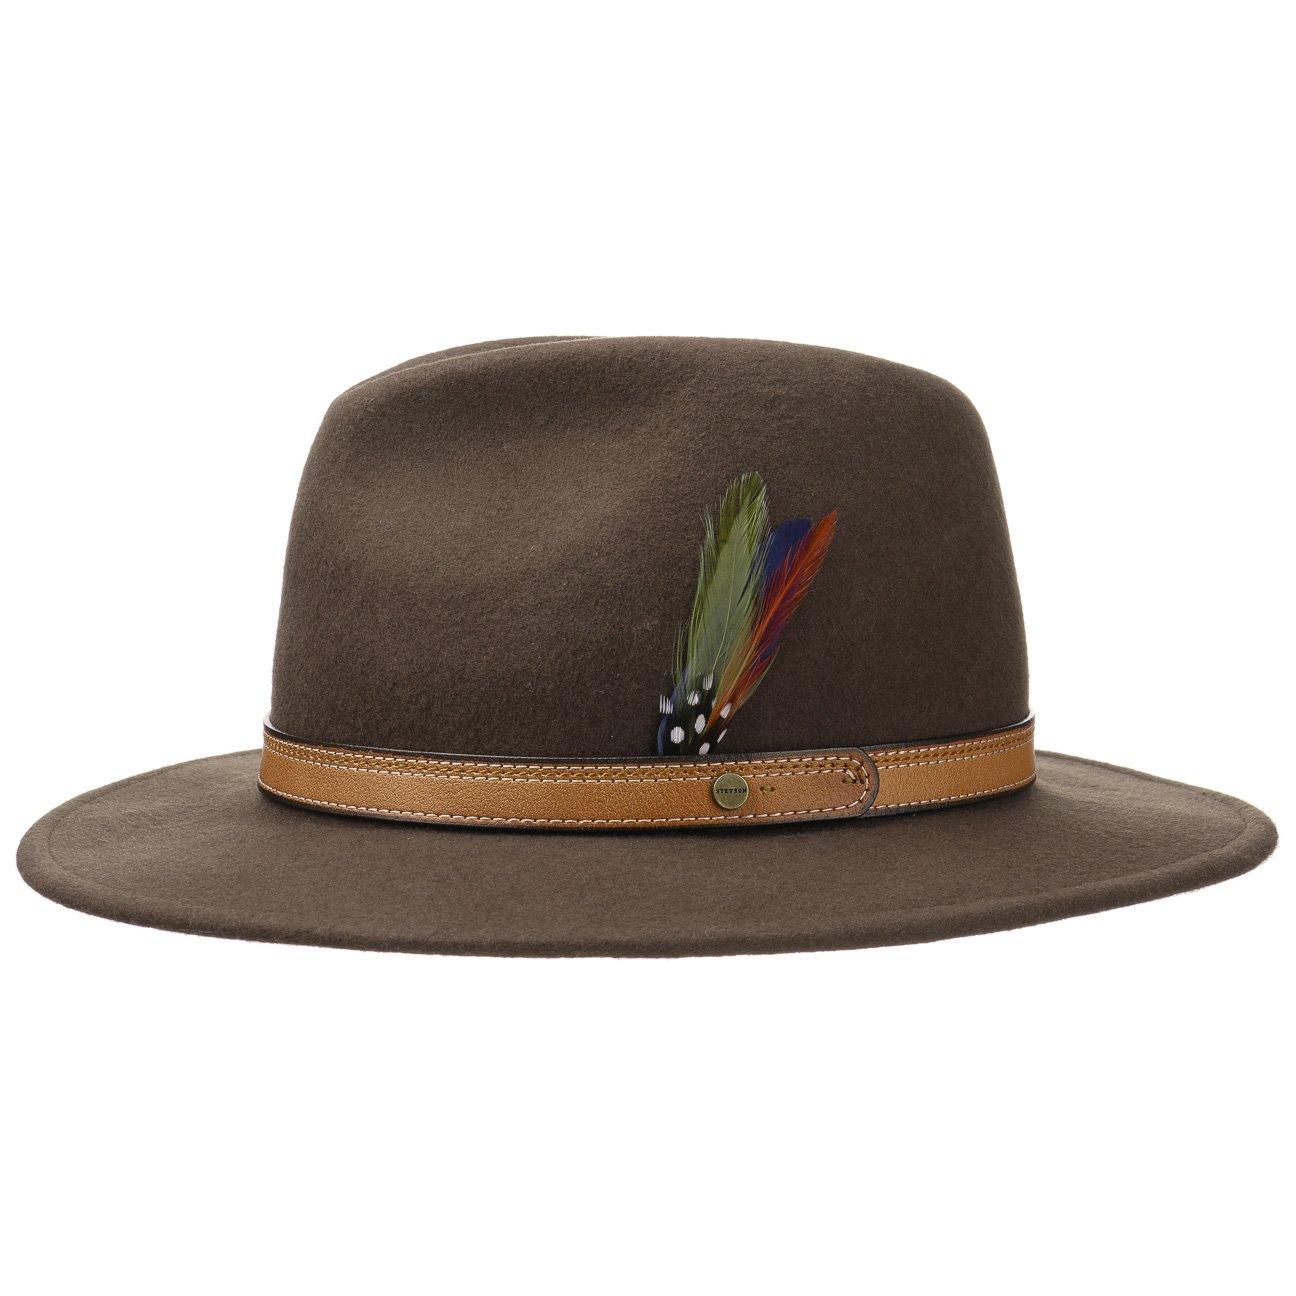 718c8eb70f4 Stetson Atla Wool Felt Traveller Hat Traveller Felt hat (XXL 62-63 -  Brown)  Amazon.co.uk  Clothing